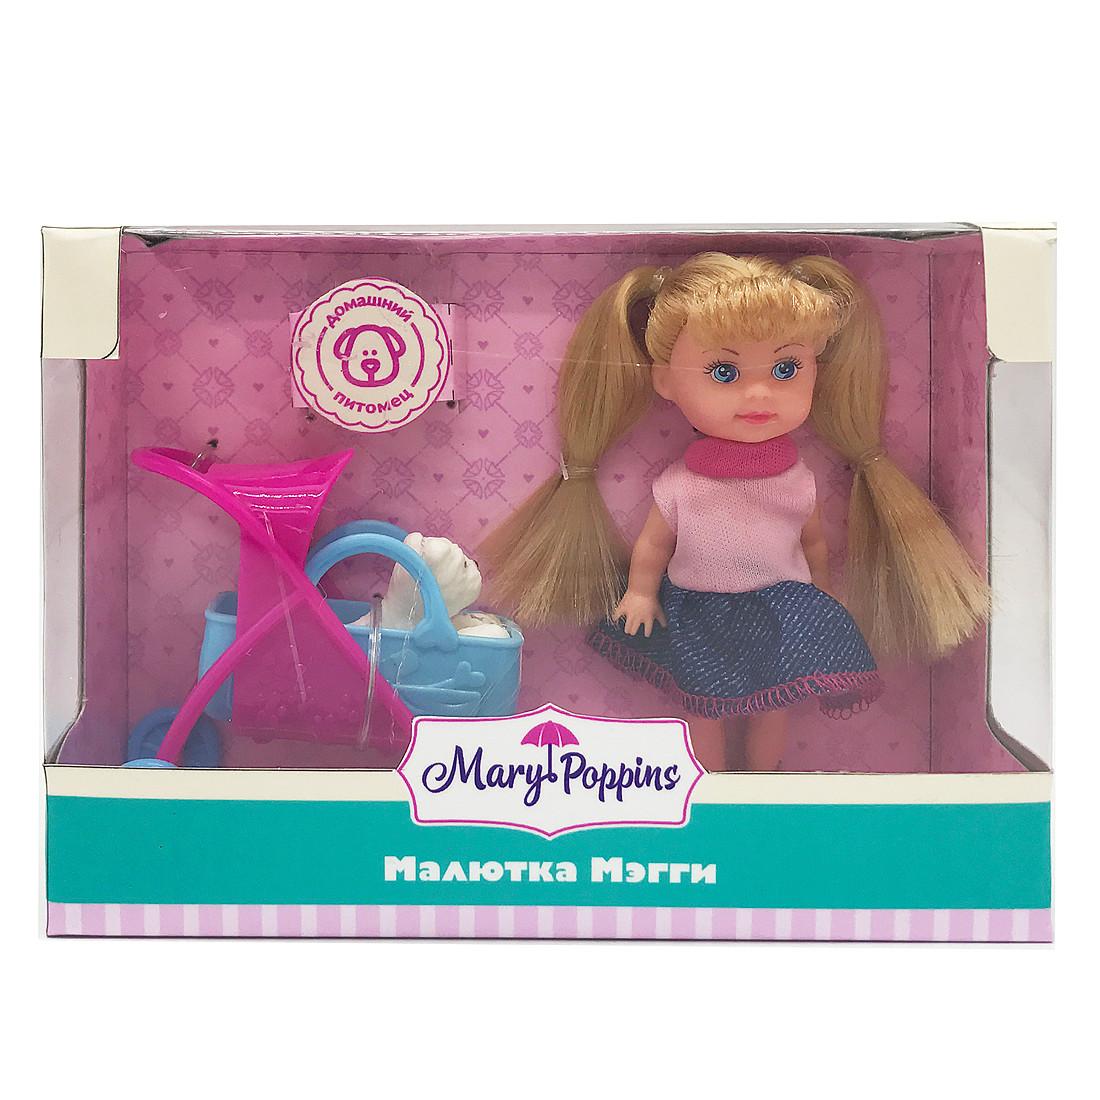 Другие куклы Mary Poppins Кукла Mary Poppins «Малютка Мэгги: Прогулка с питомцем» 9 см детские зонтики mary poppins автомобиль 46 см